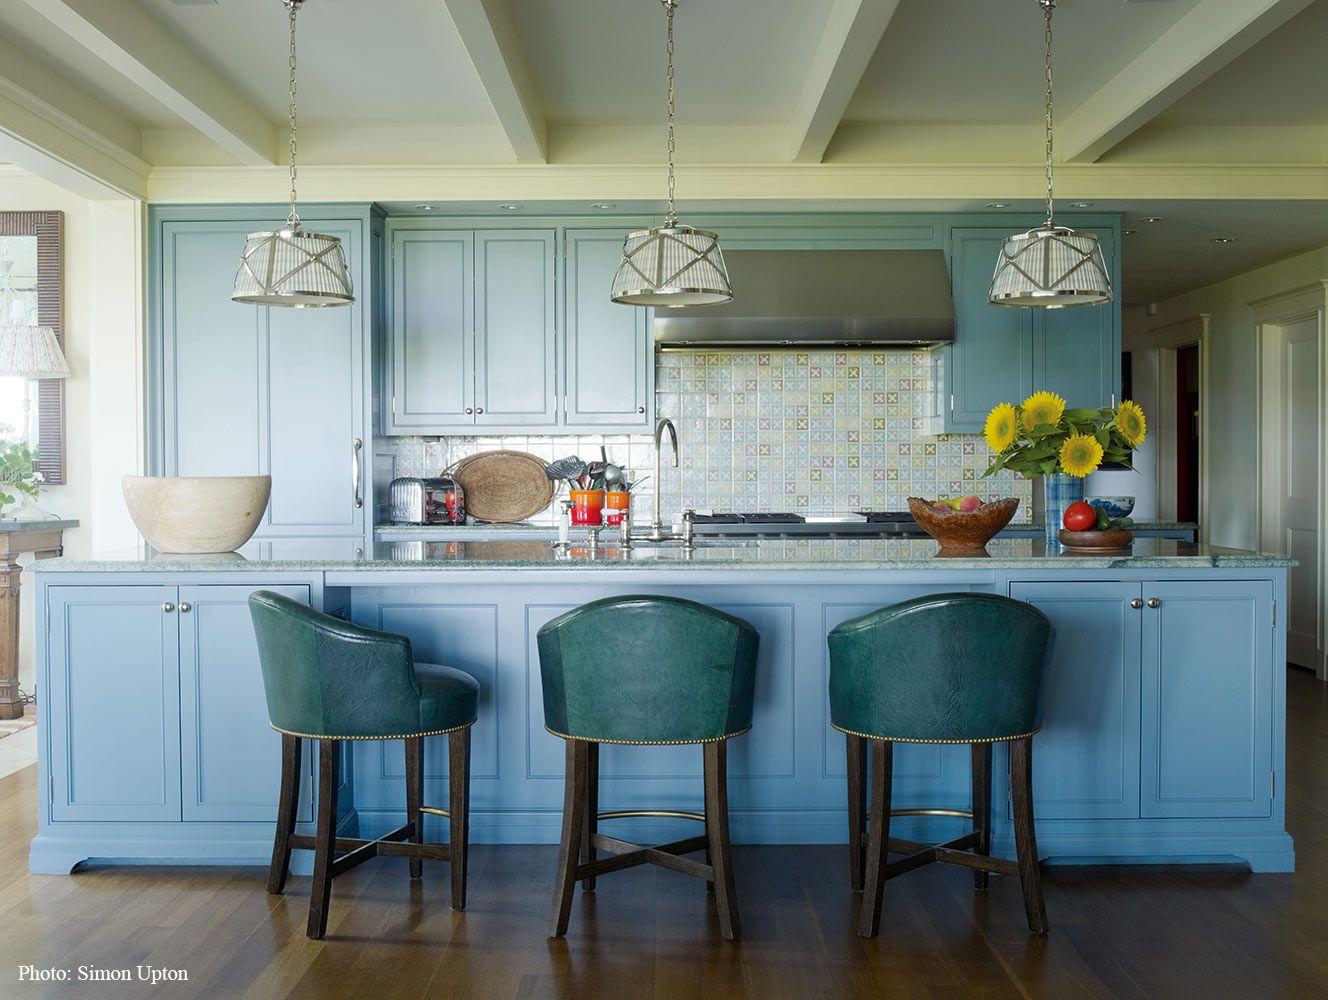 Sibyl colefax u john fowler interior design and decoration others